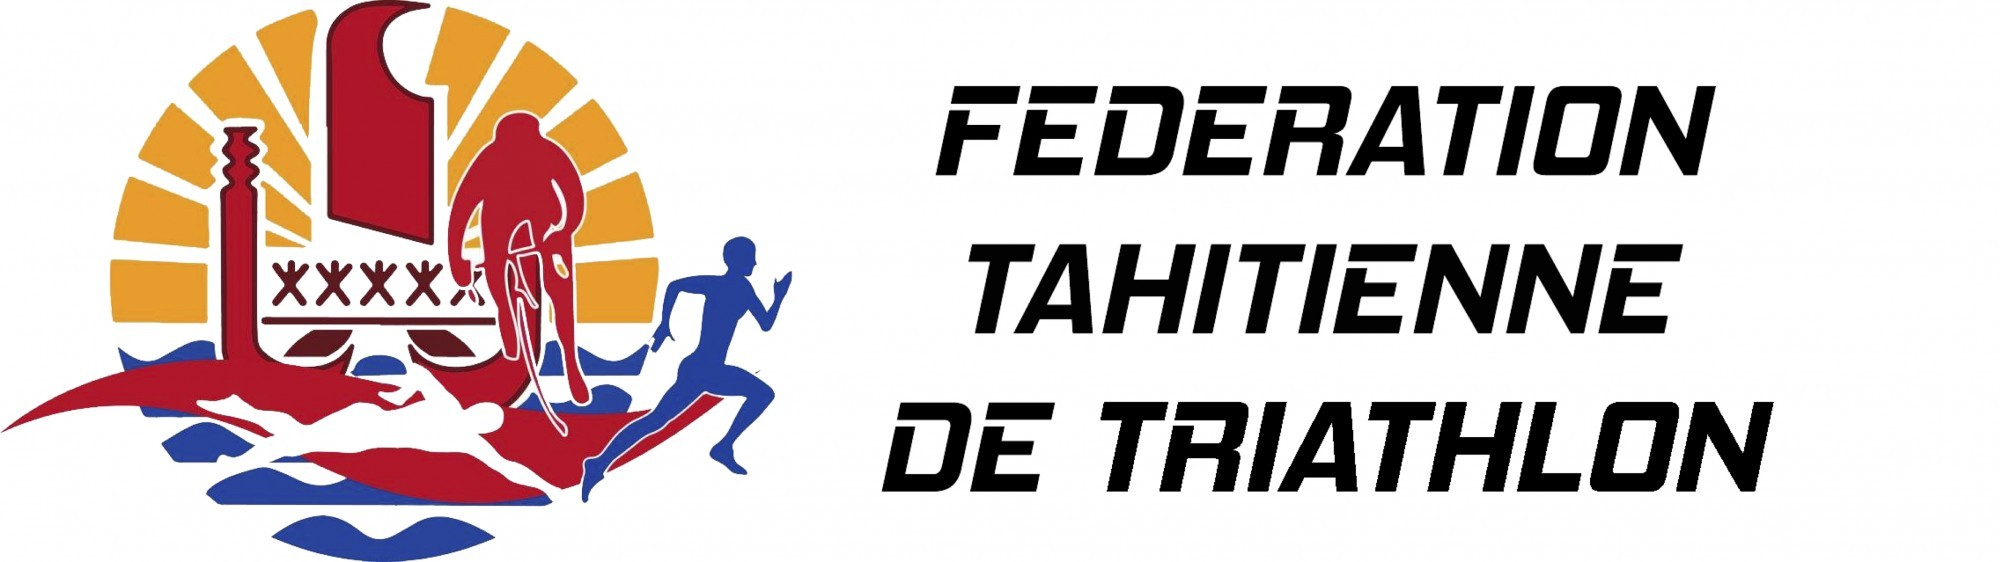 Fédération Tahitienne de Triathlon logo